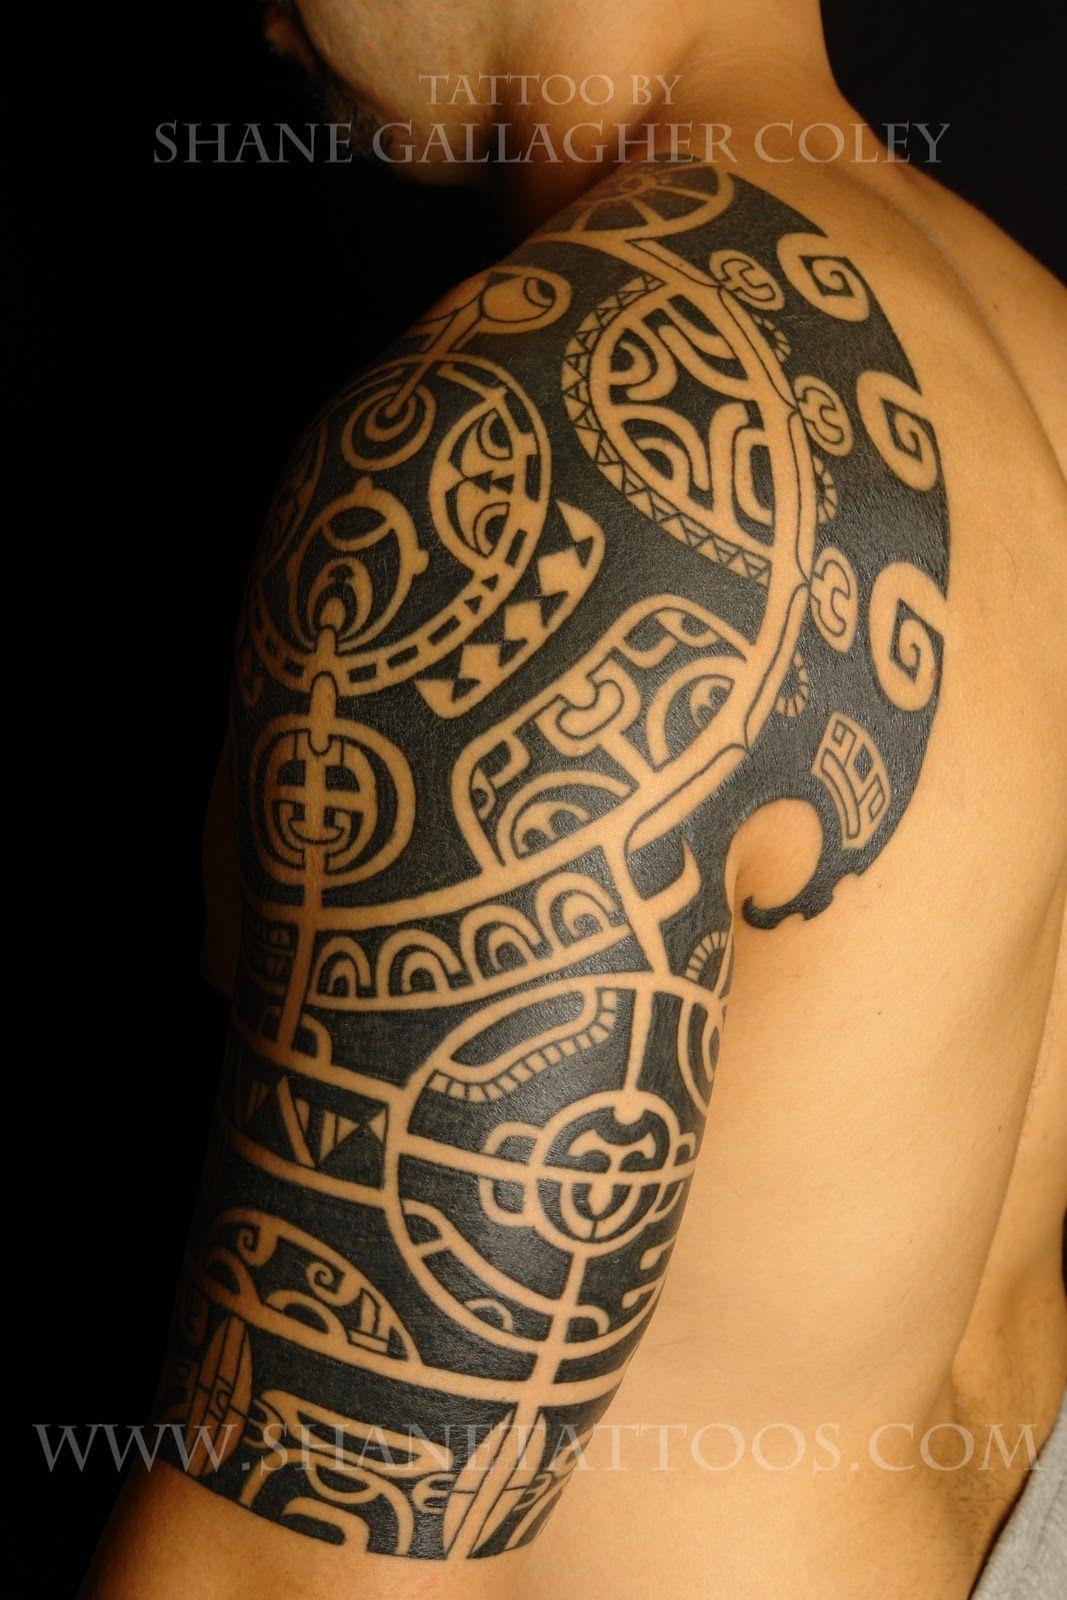 shane tattoos dwayne the rock johnson inspired tattoo on harry sleeve tattoos rock artist. Black Bedroom Furniture Sets. Home Design Ideas